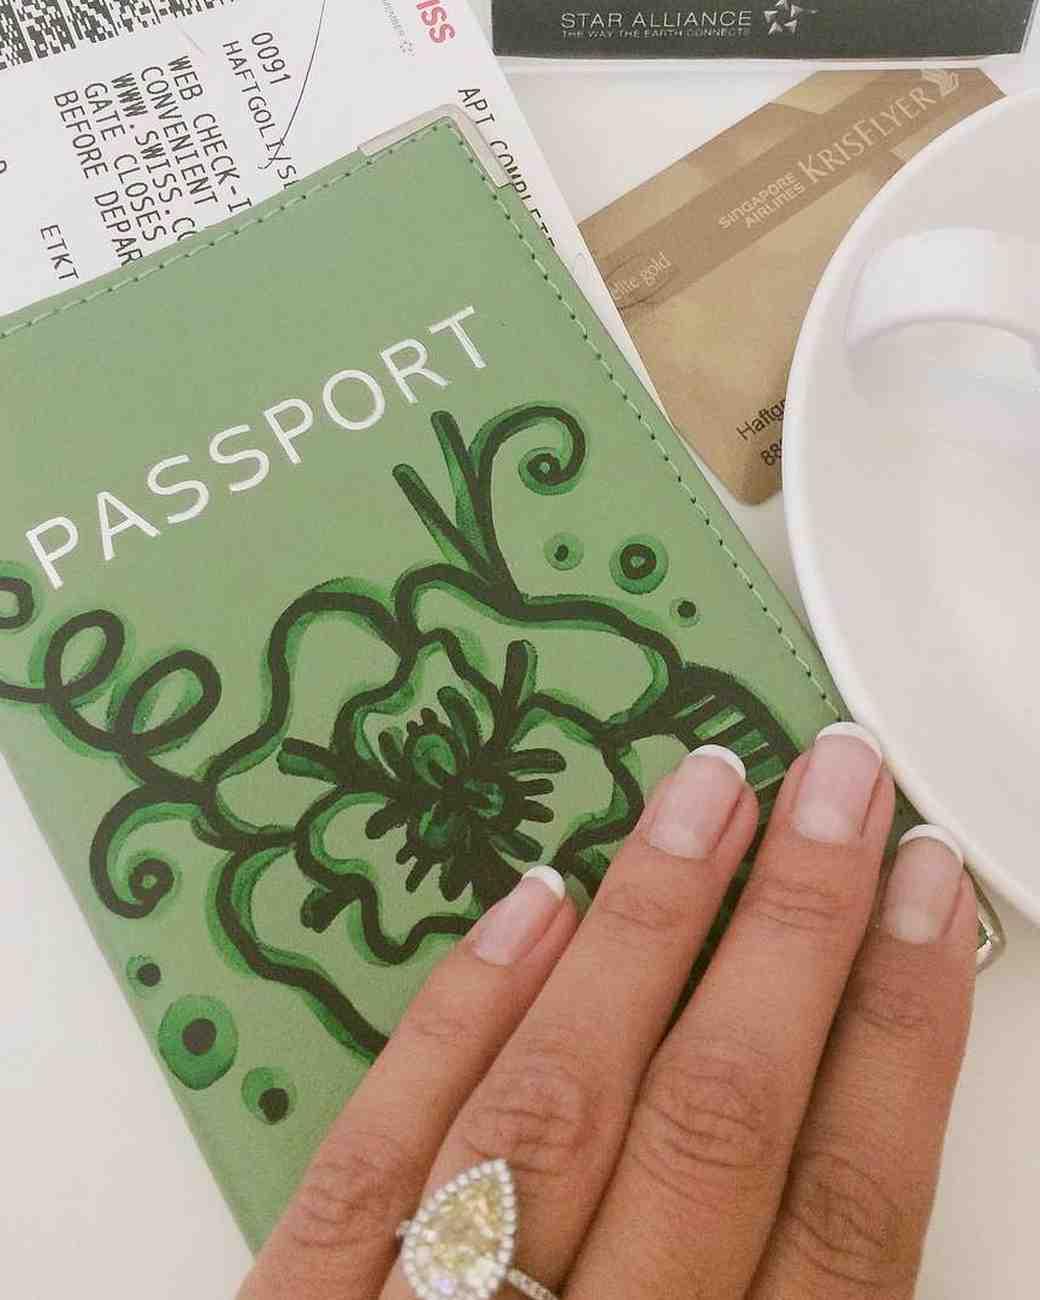 engagement-ring-selfies-passport-0216.jpg